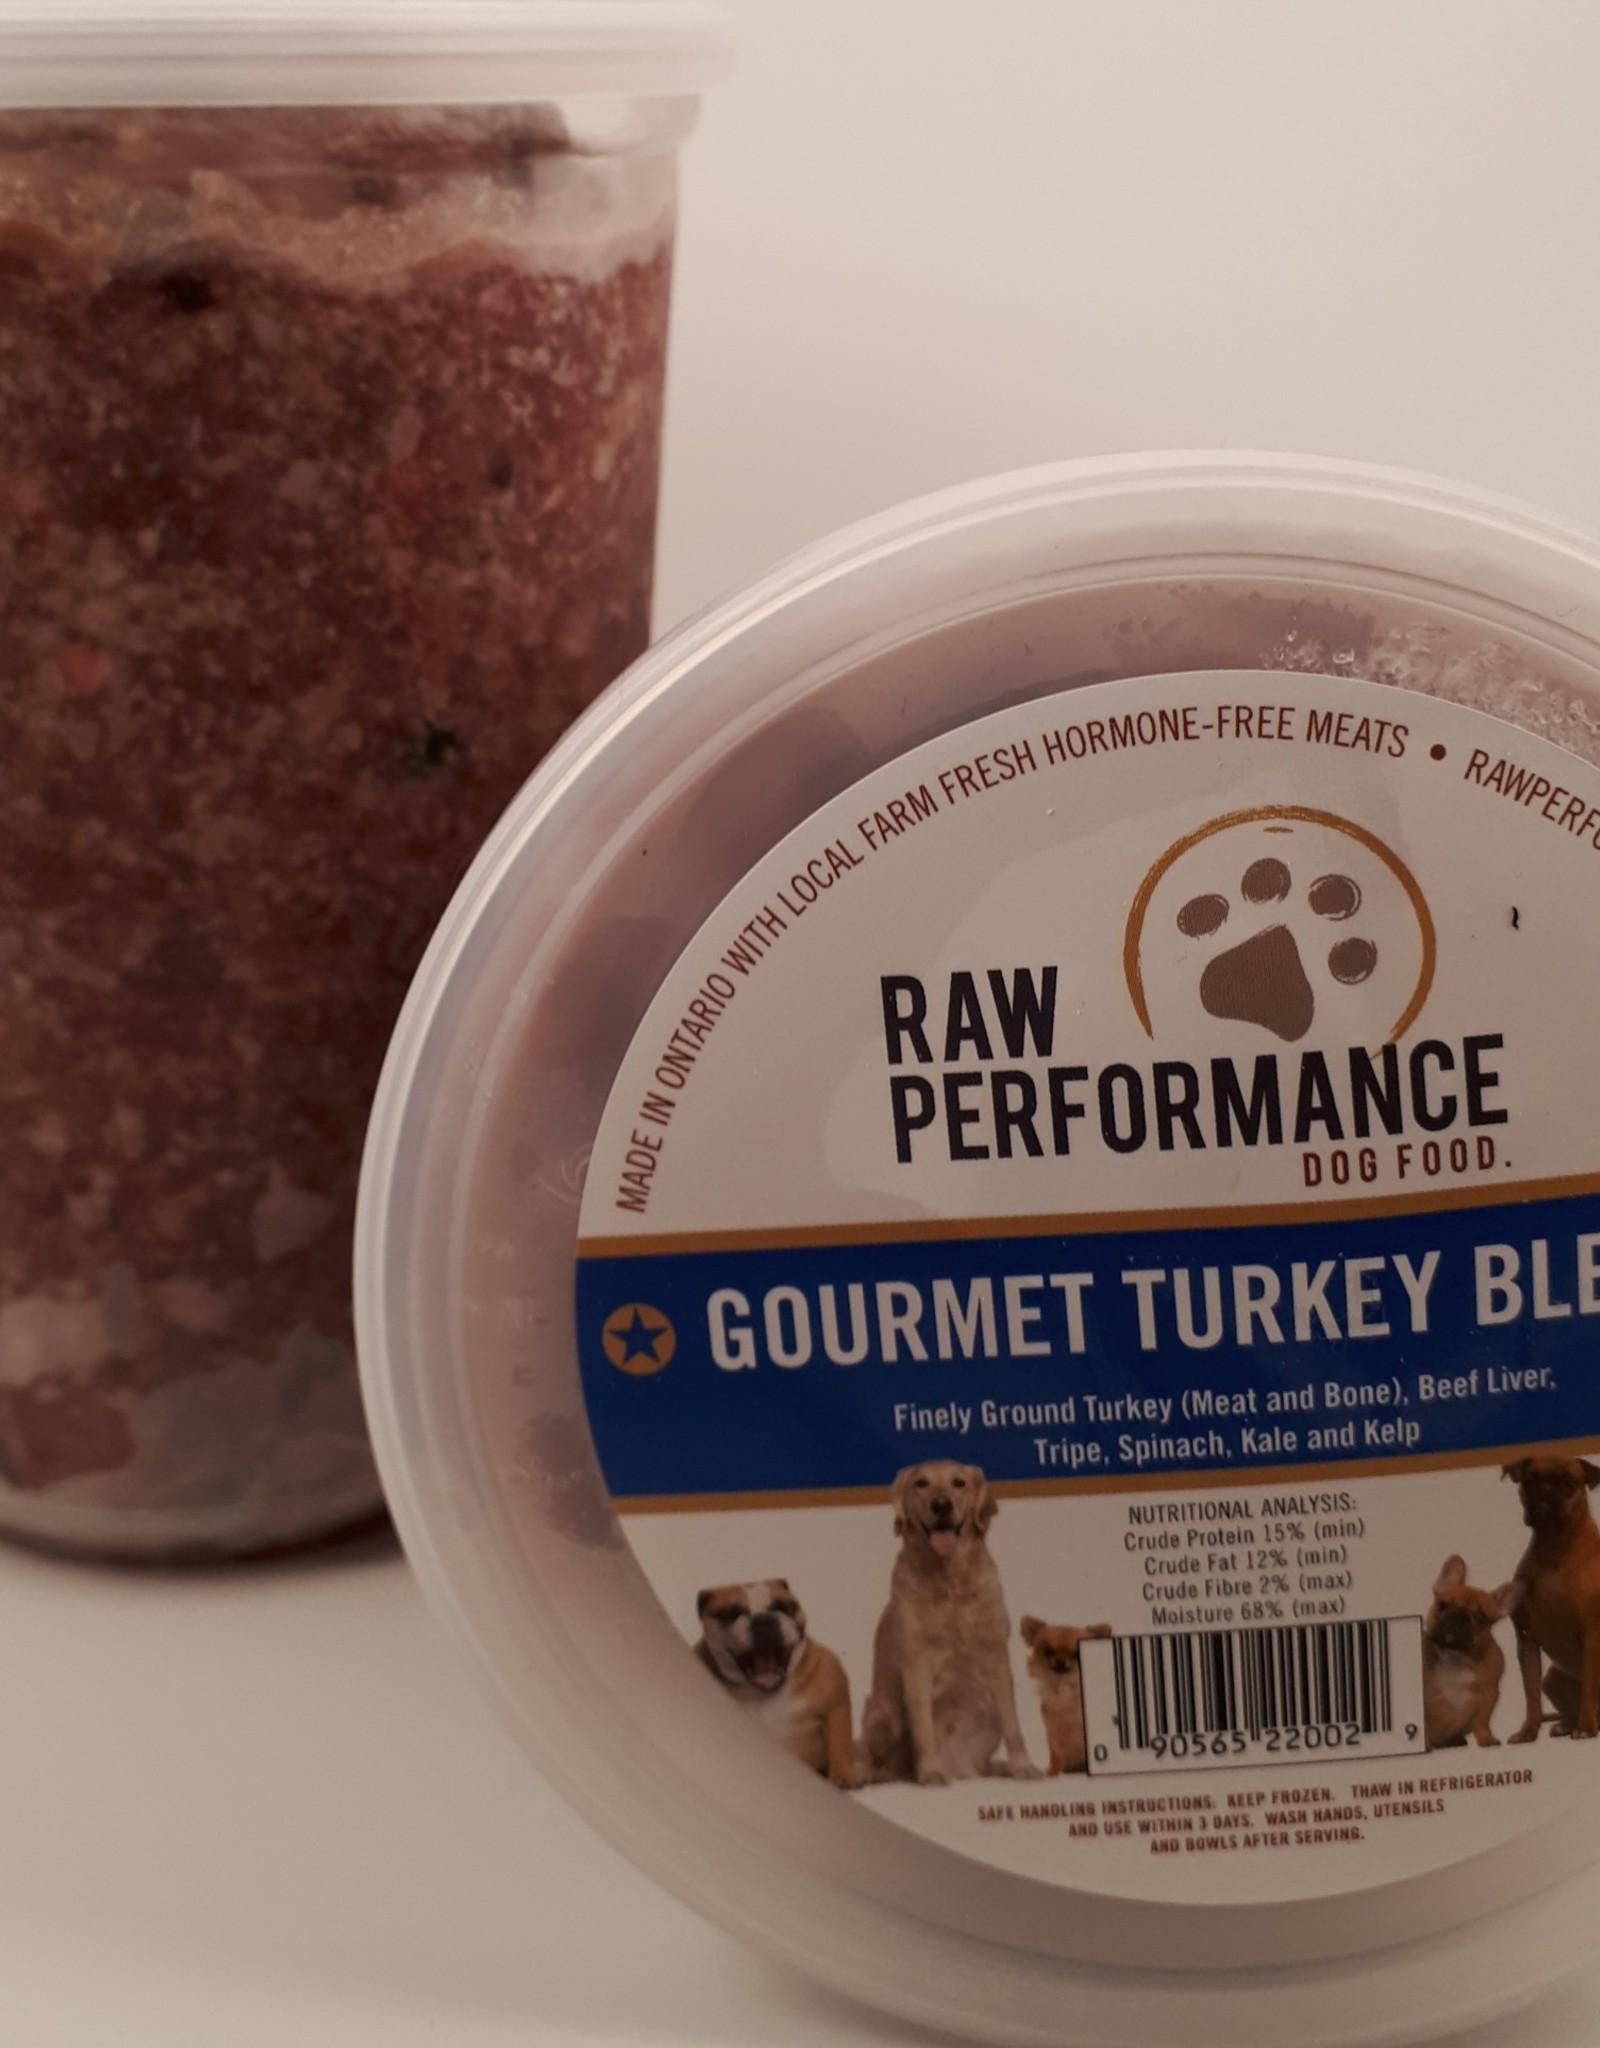 Raw Performance Raw Performance gourmet turkey 2lbs